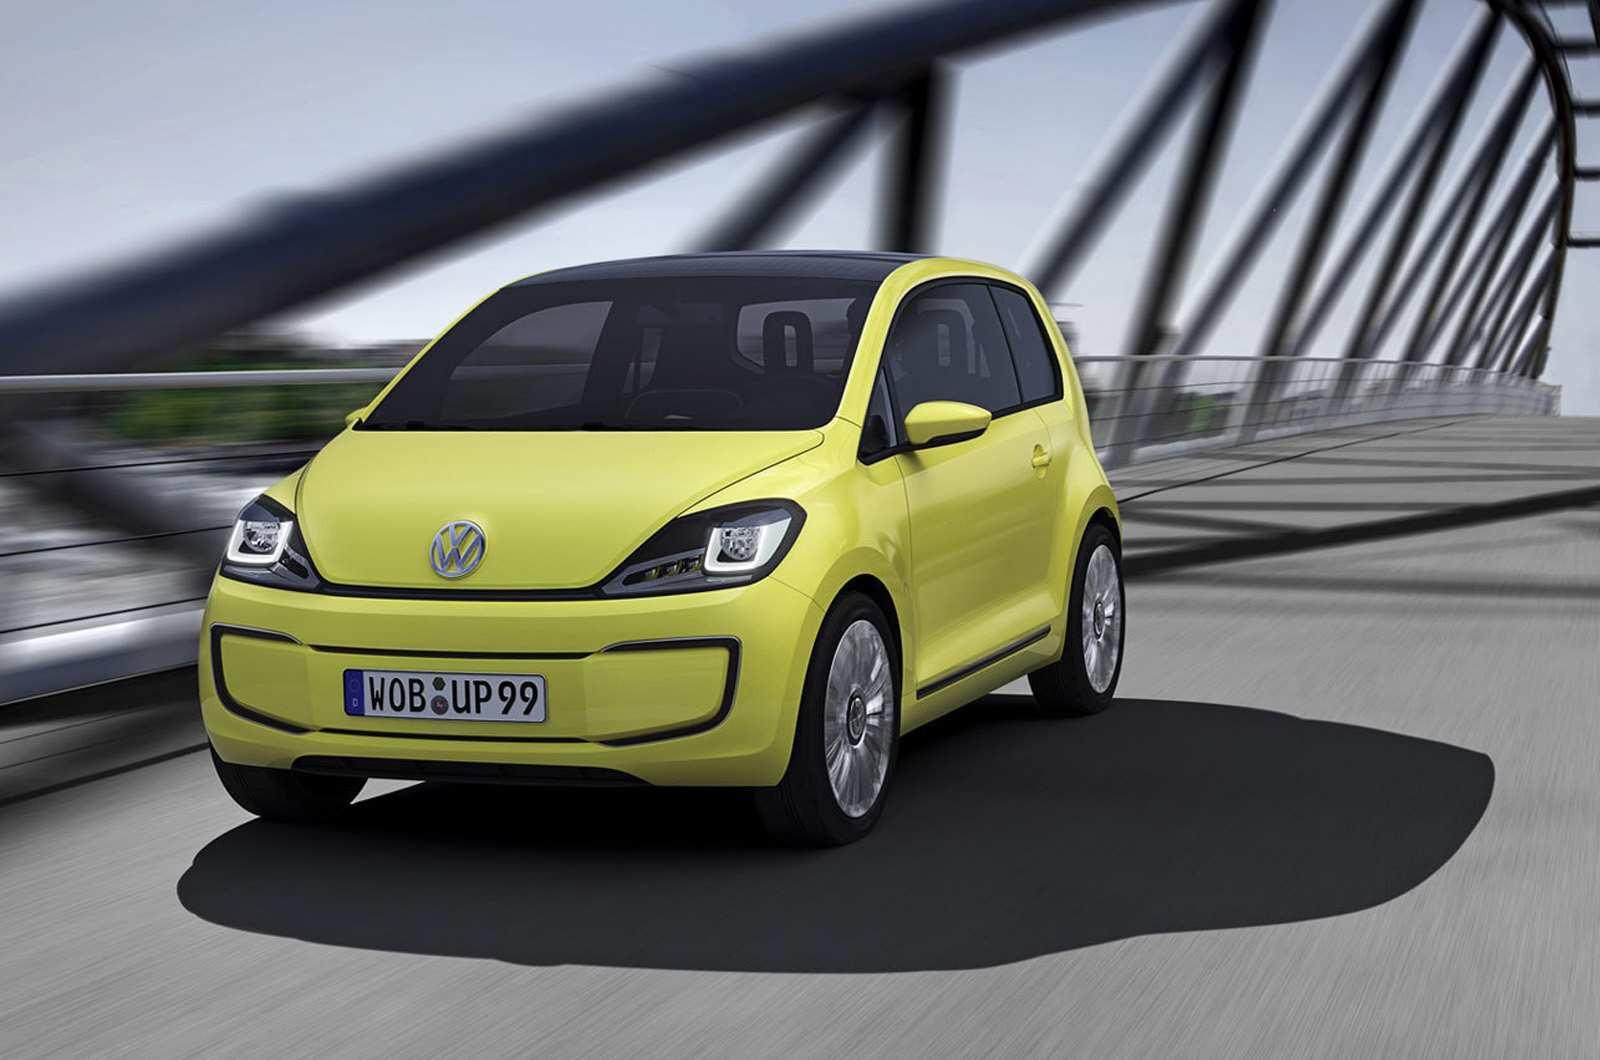 40 Gallery of Volkswagen E Up 2020 Interior for Volkswagen E Up 2020